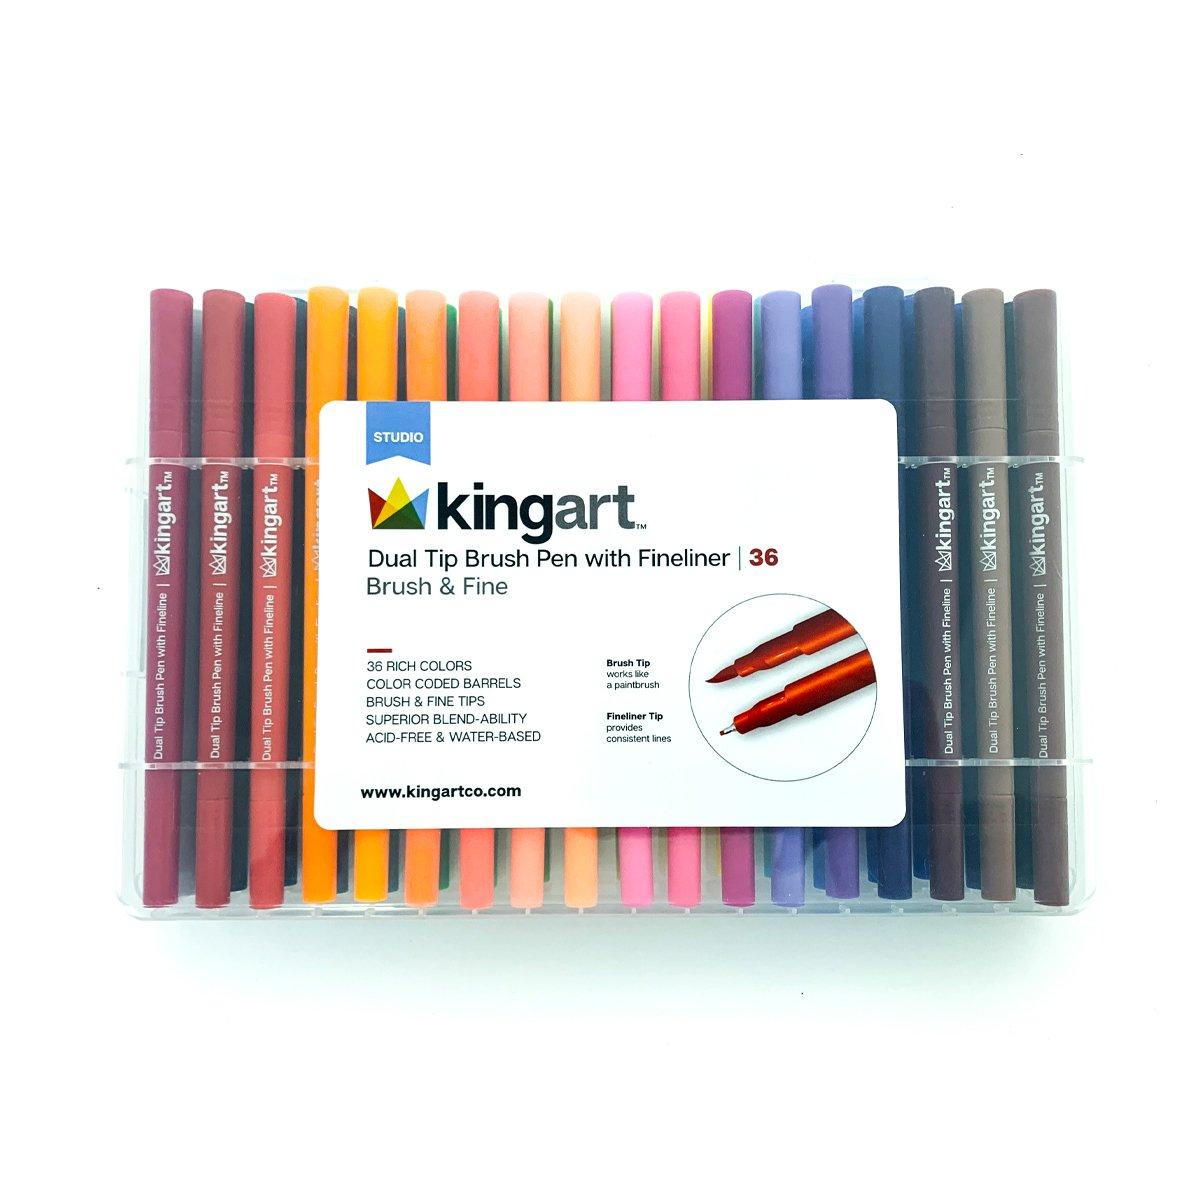 Studio Dual Tip Brush Pen Art Markers With Fineliner Set Of 36